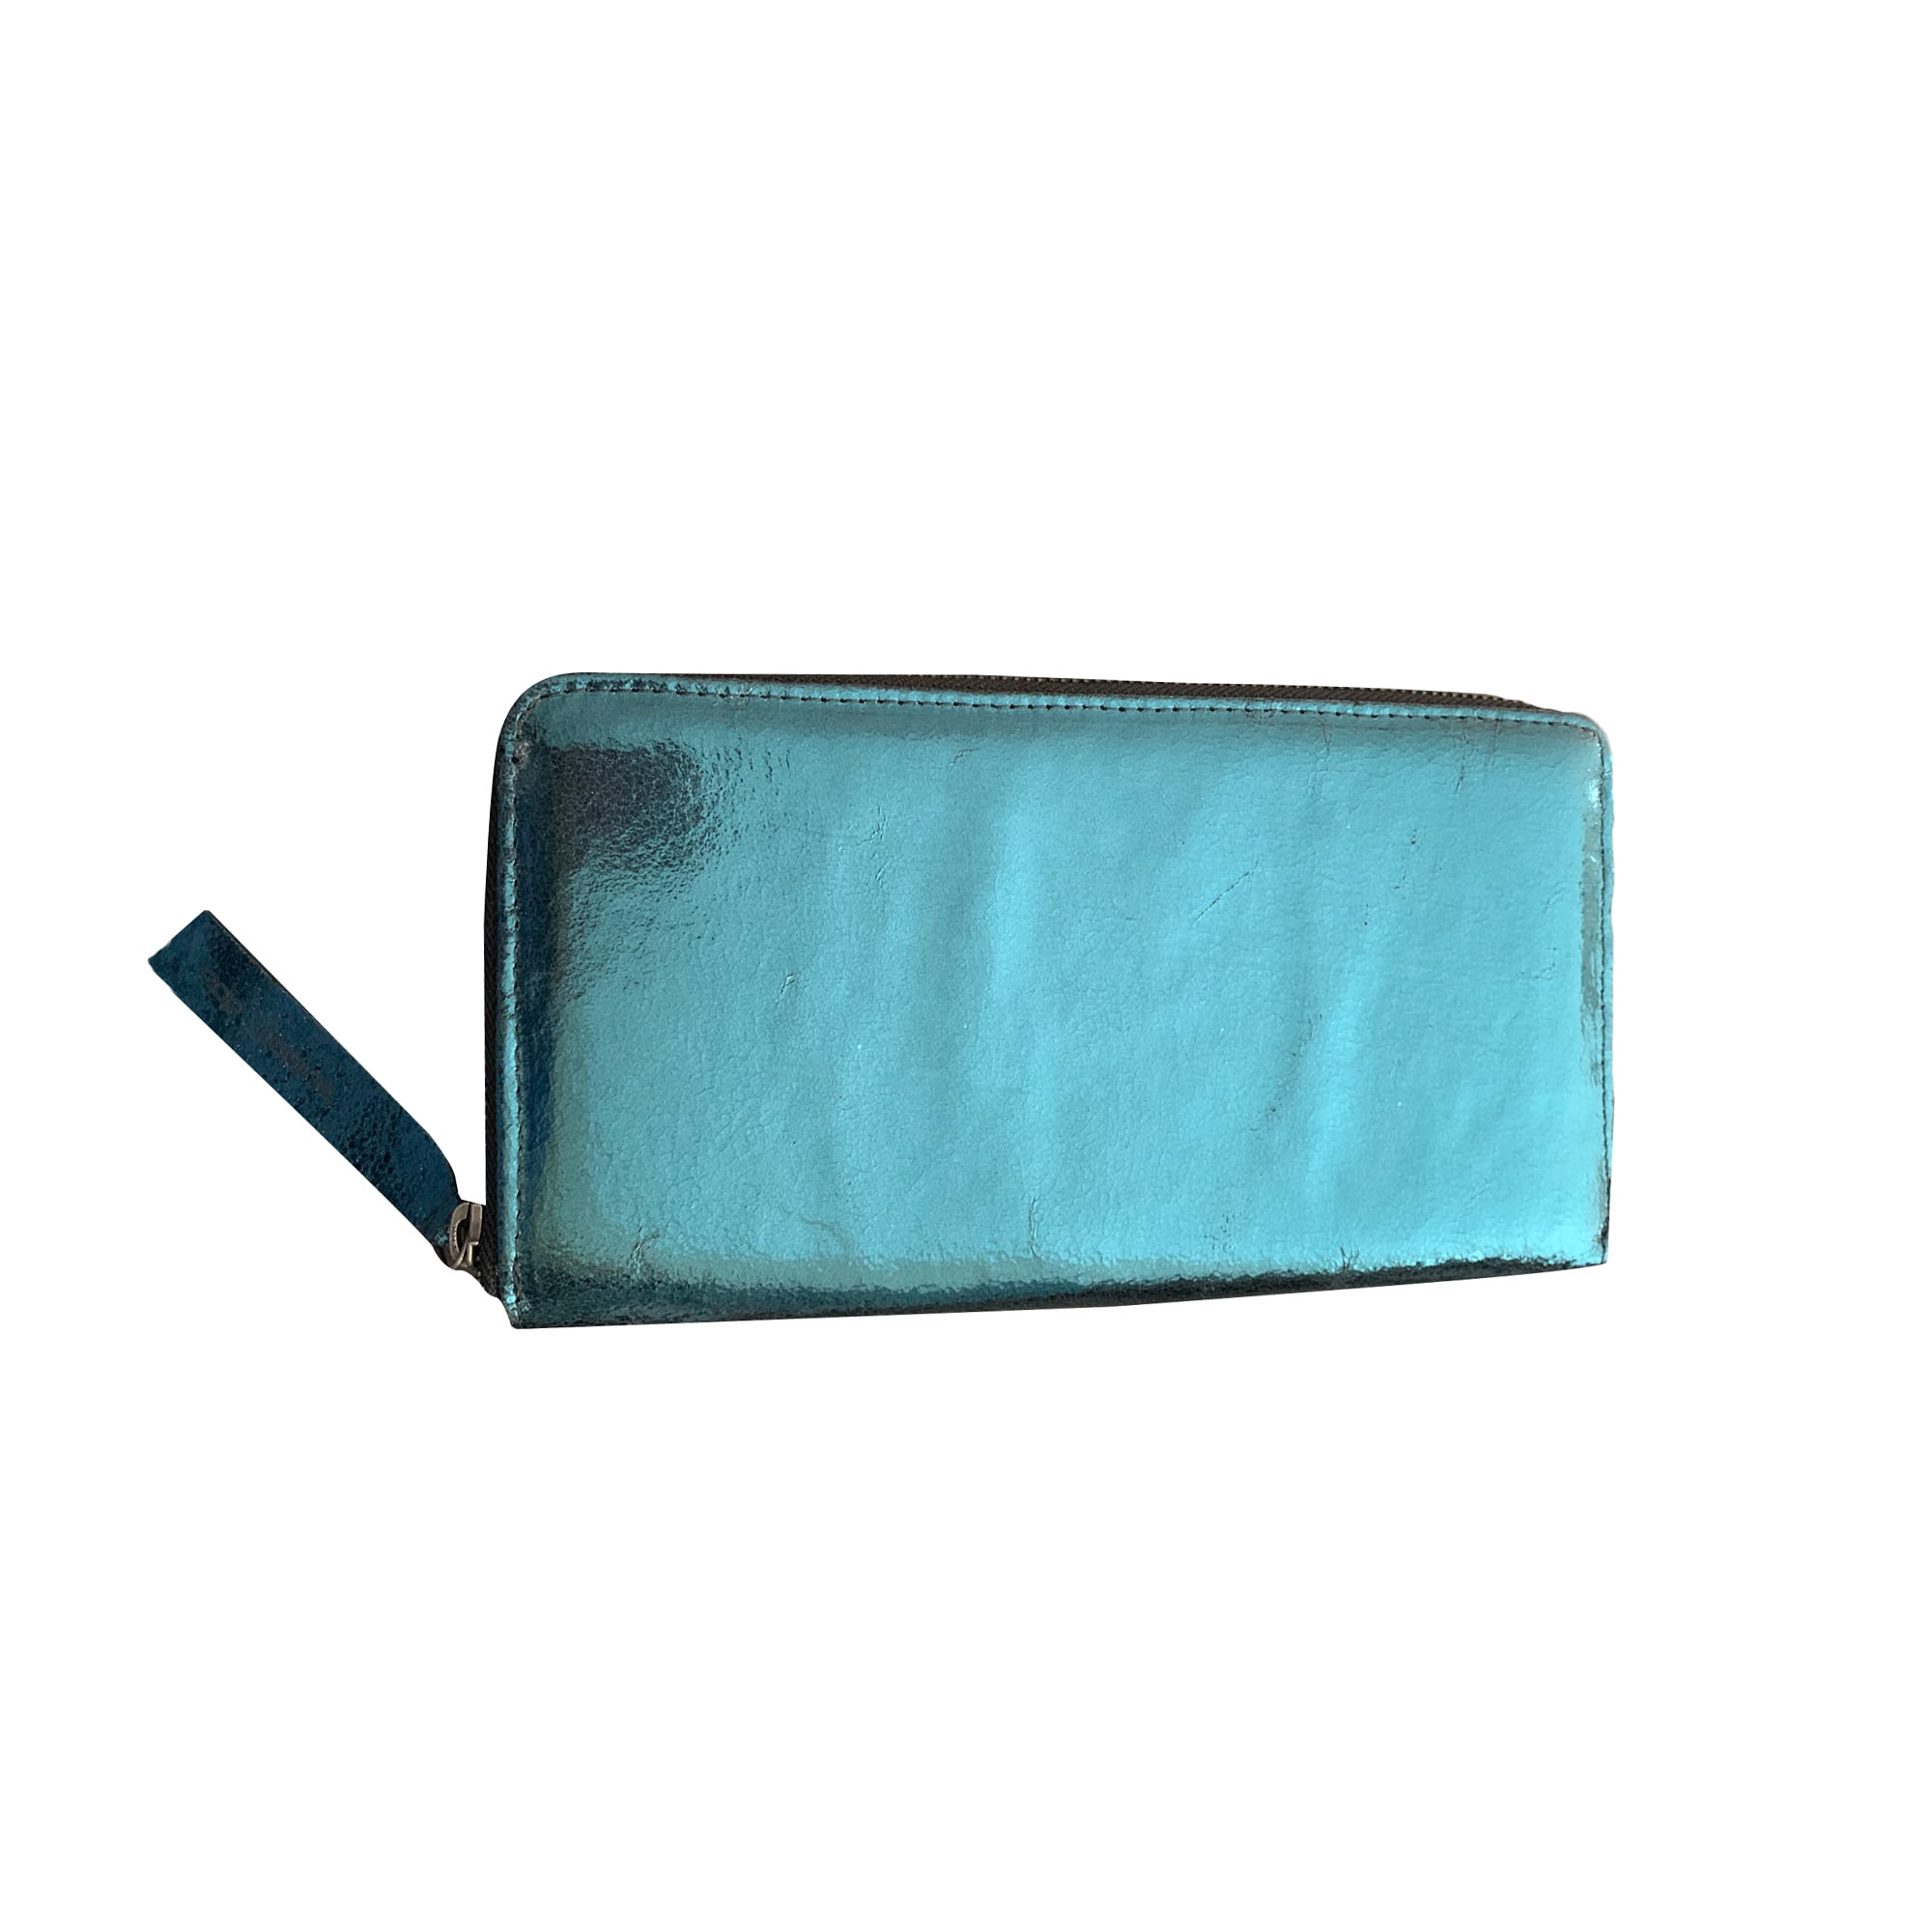 Portefeuille COP-COPINE cuir bleu